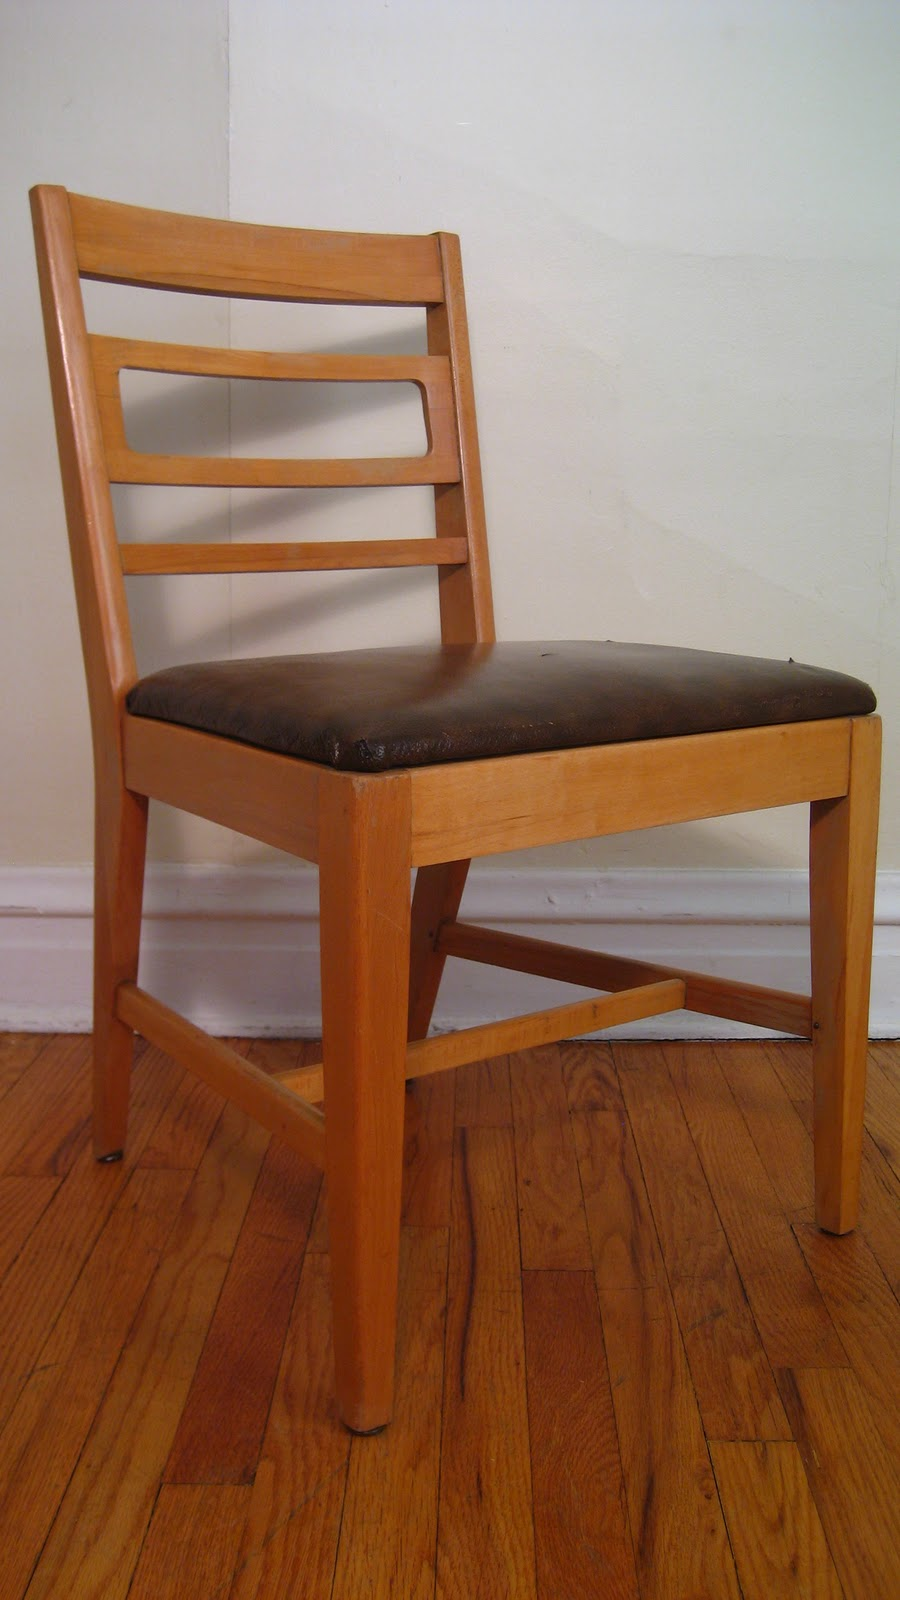 Flatout design edward wormley dining chairs - Edward wormley chairs ...